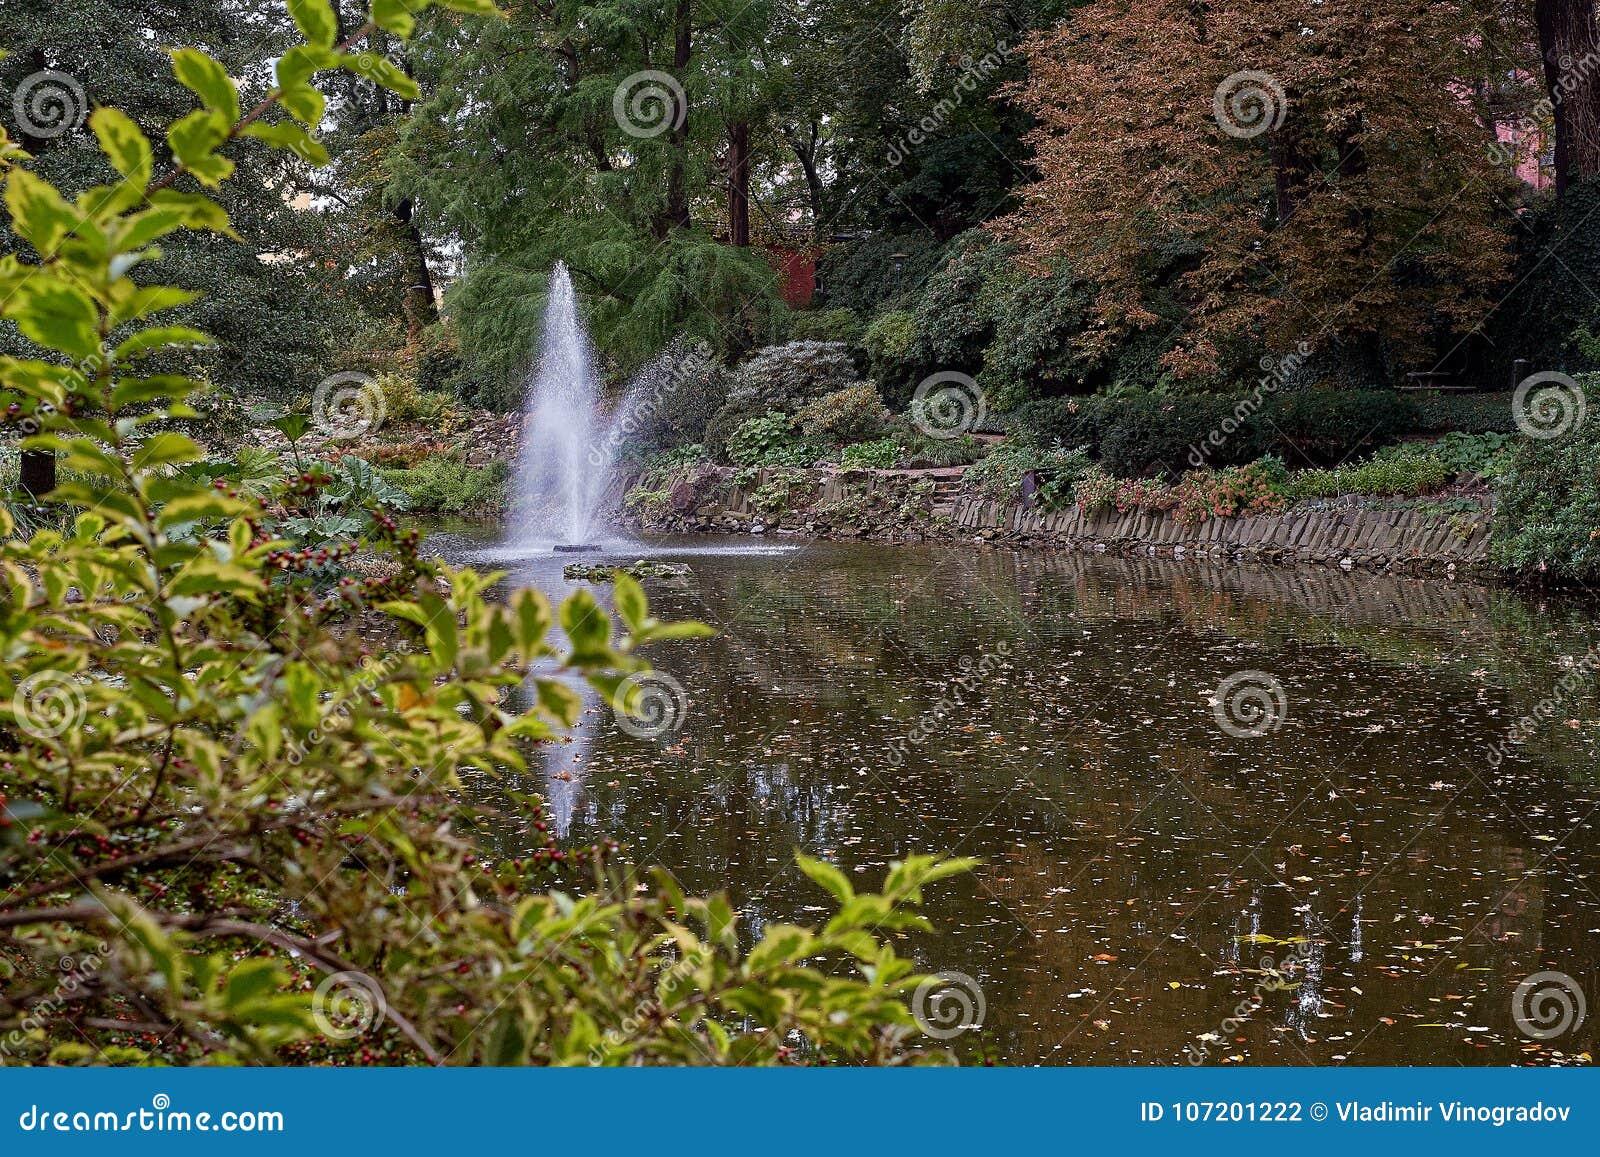 Famous Fountain In Beautiful Japanese Garden In Botanical Garden Of ...